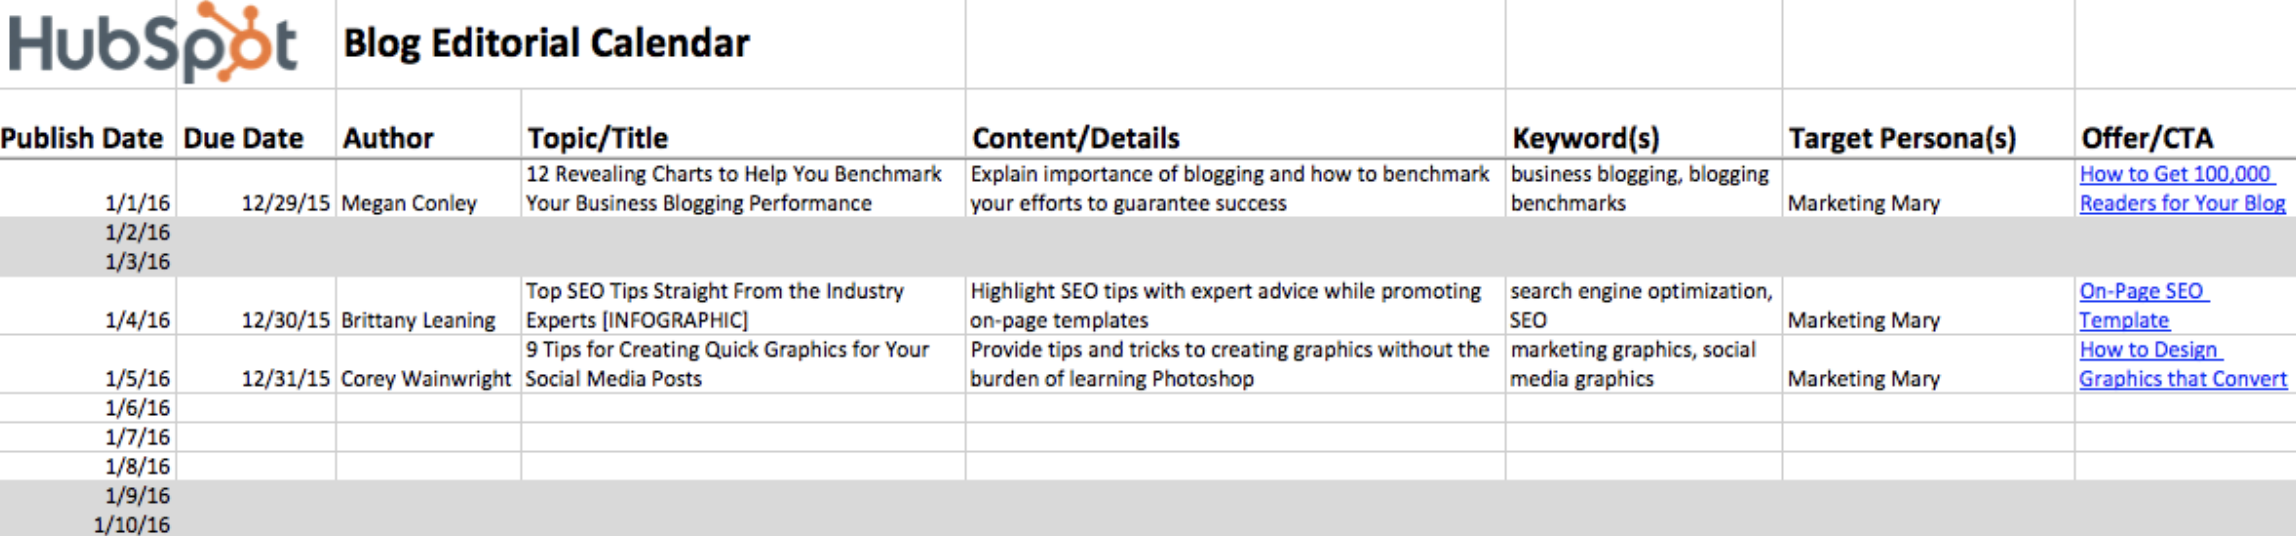 HubSpot's Blog Editorial Calendar - Free Template in Excel